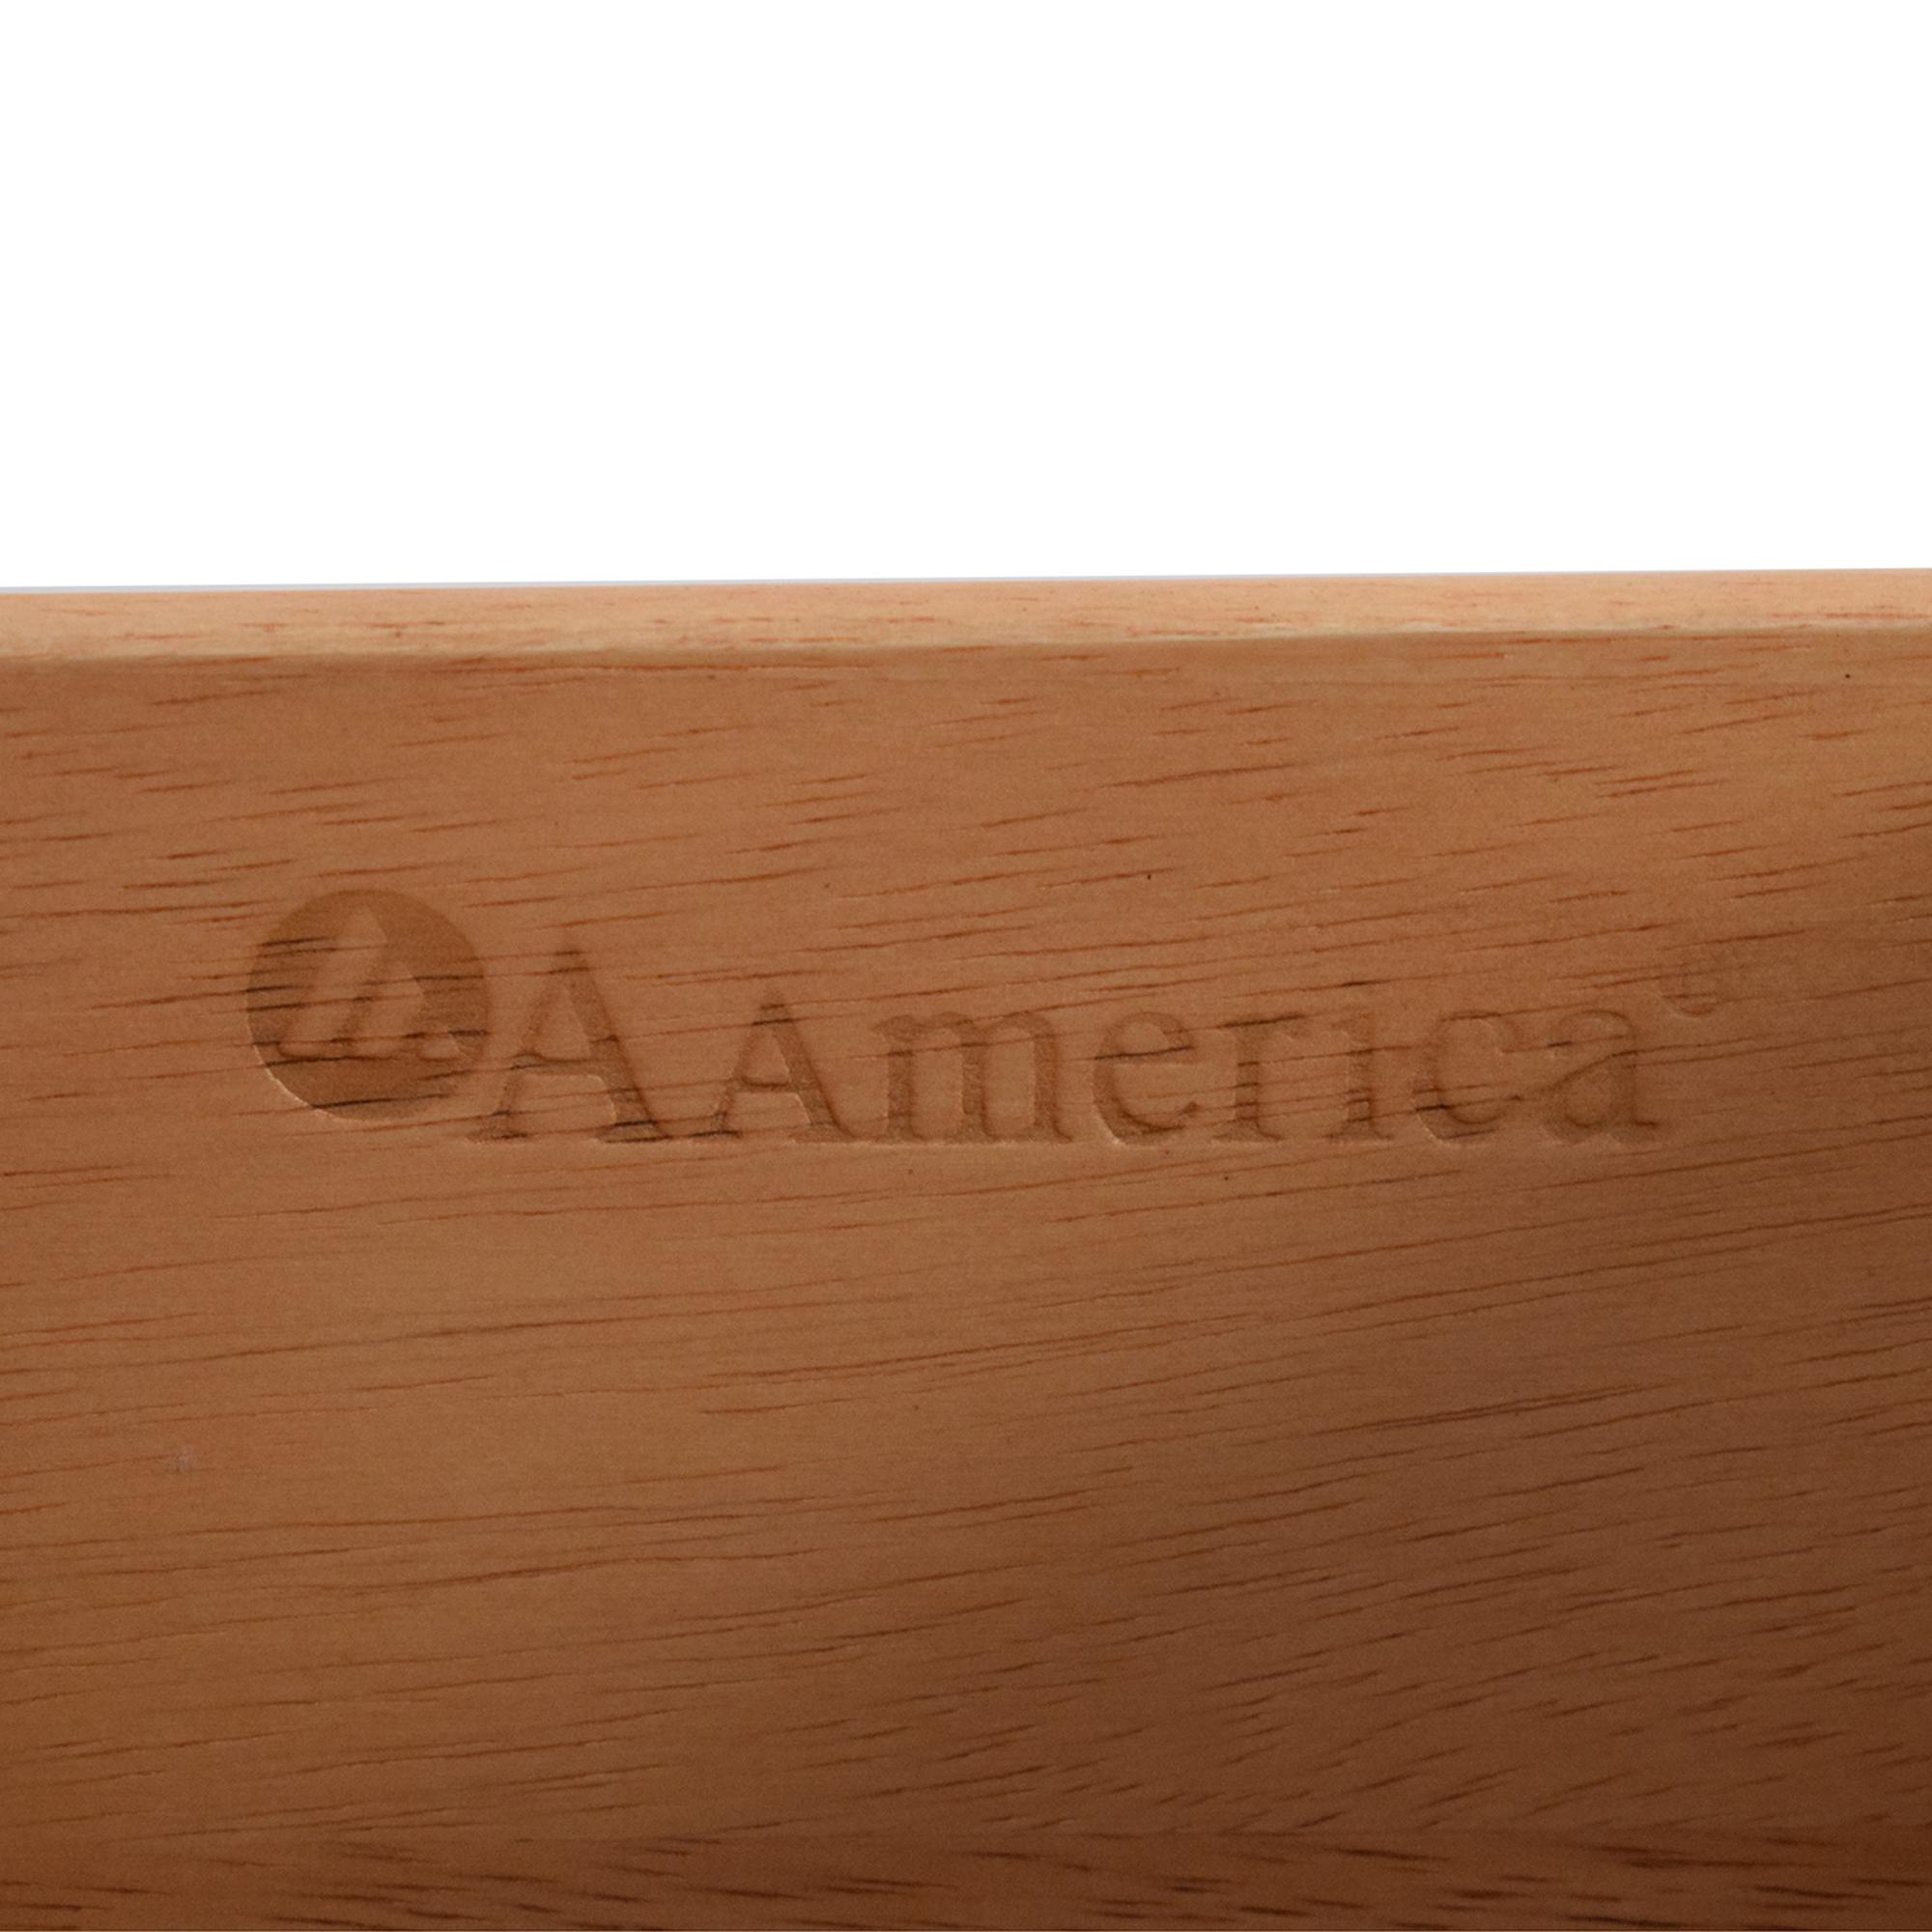 A-America Wood Furniture A-America Westlake Master Dresser with Mirror Storage